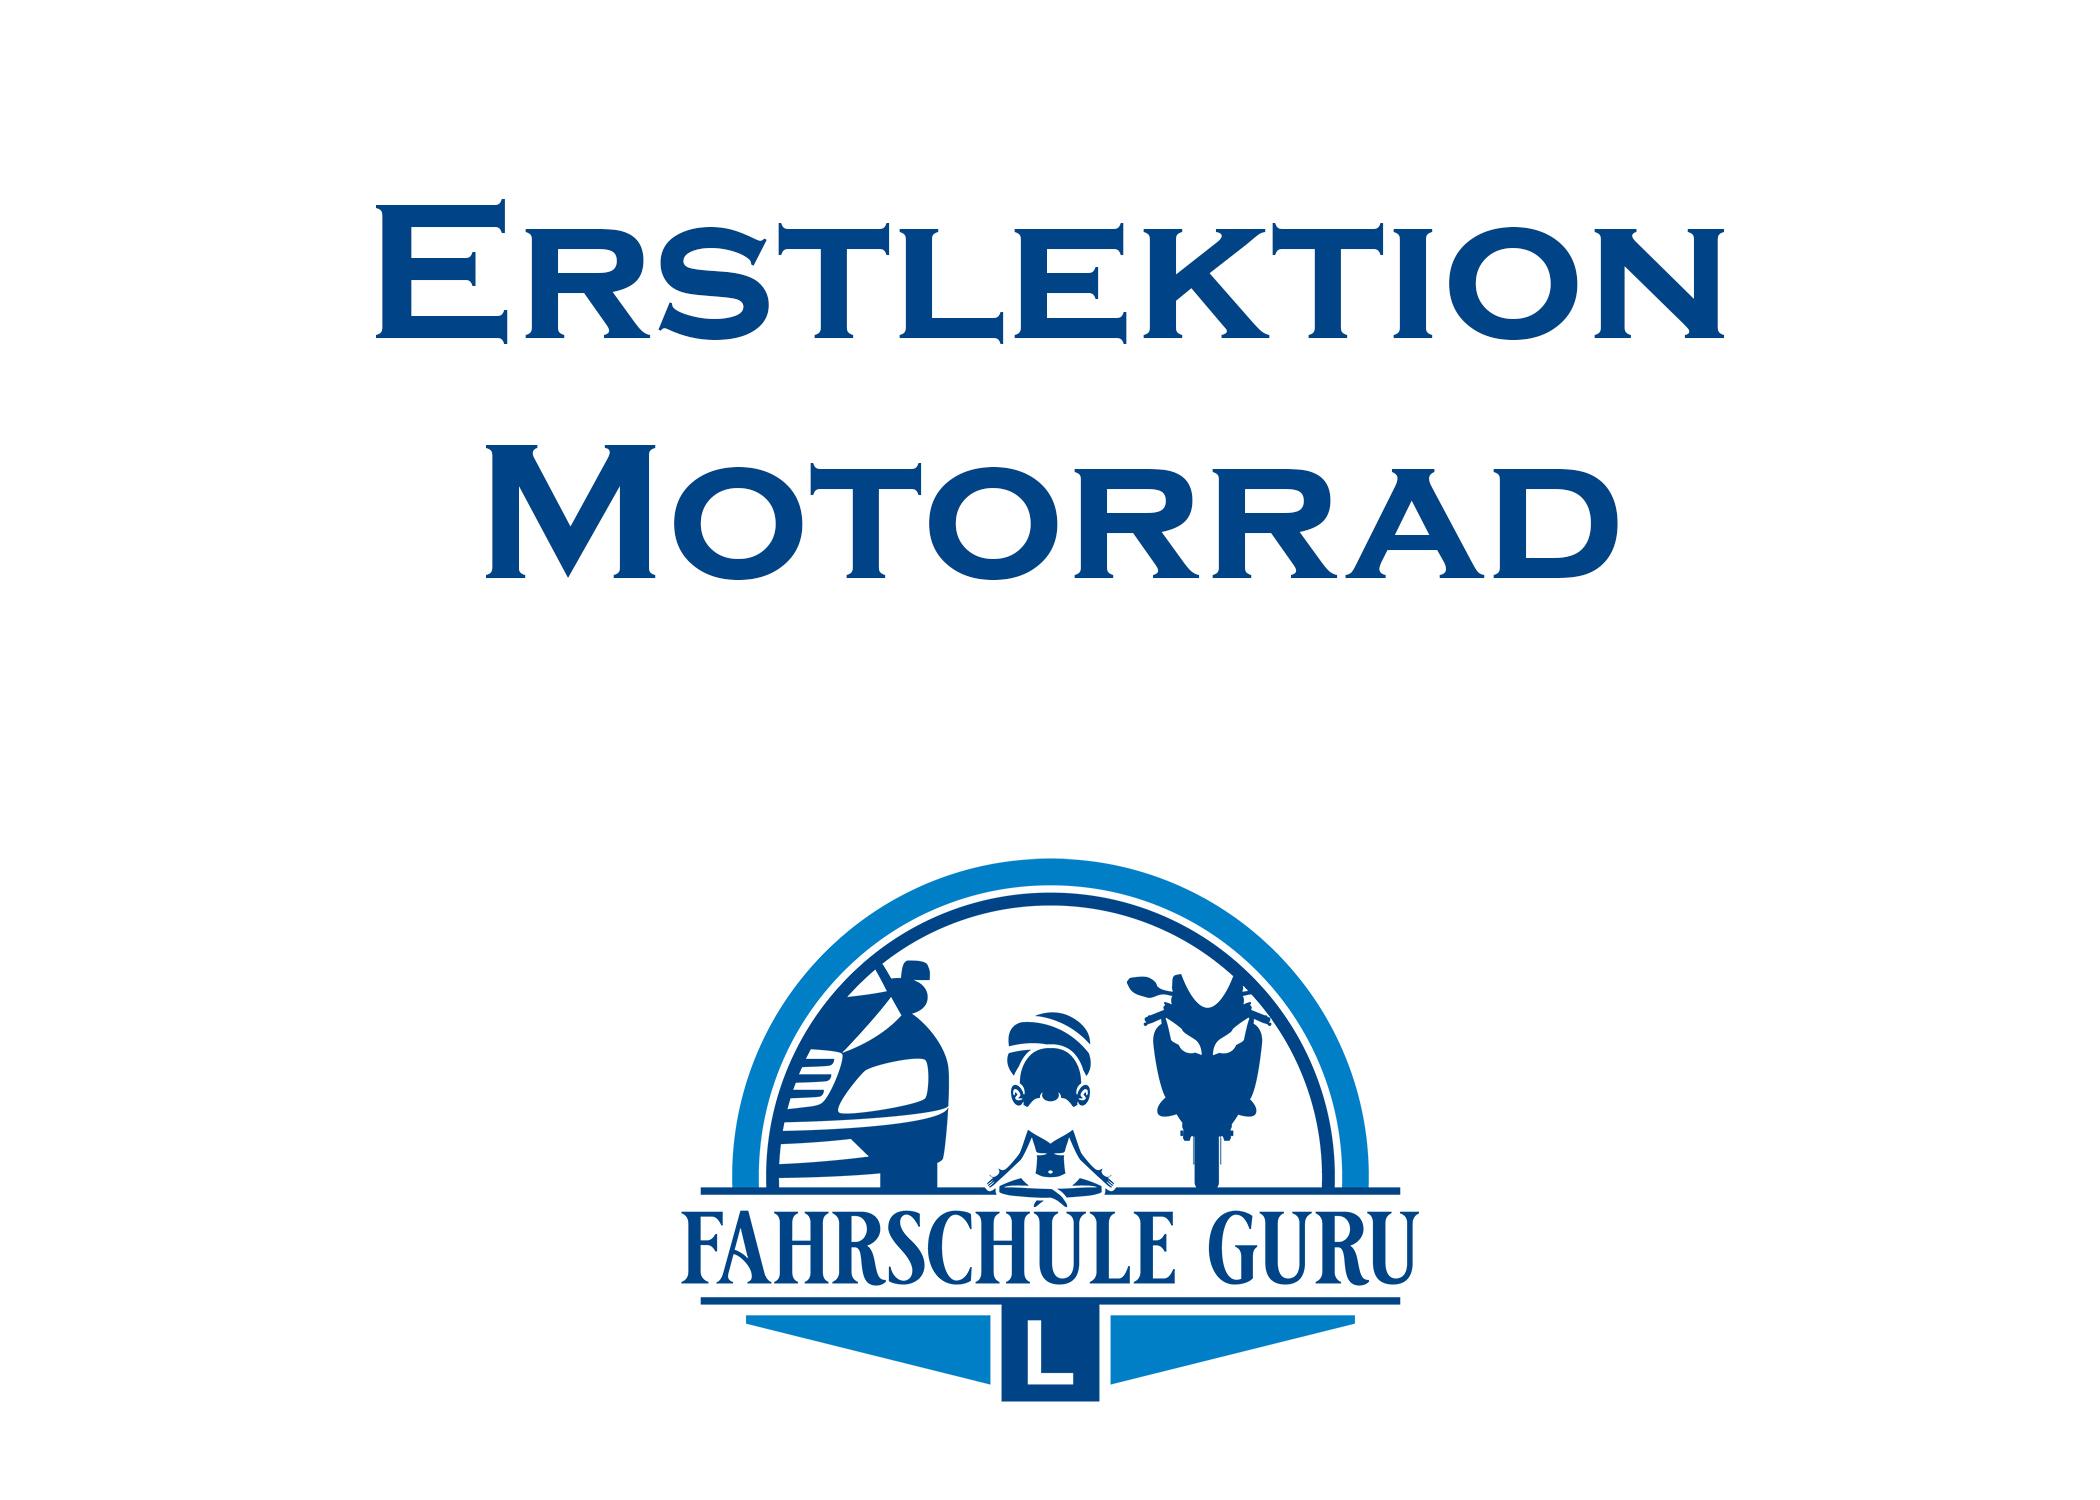 3. Erstlektion Motorrad ohne Eigenes Motorrad (Kat. A1 oder A35kW)